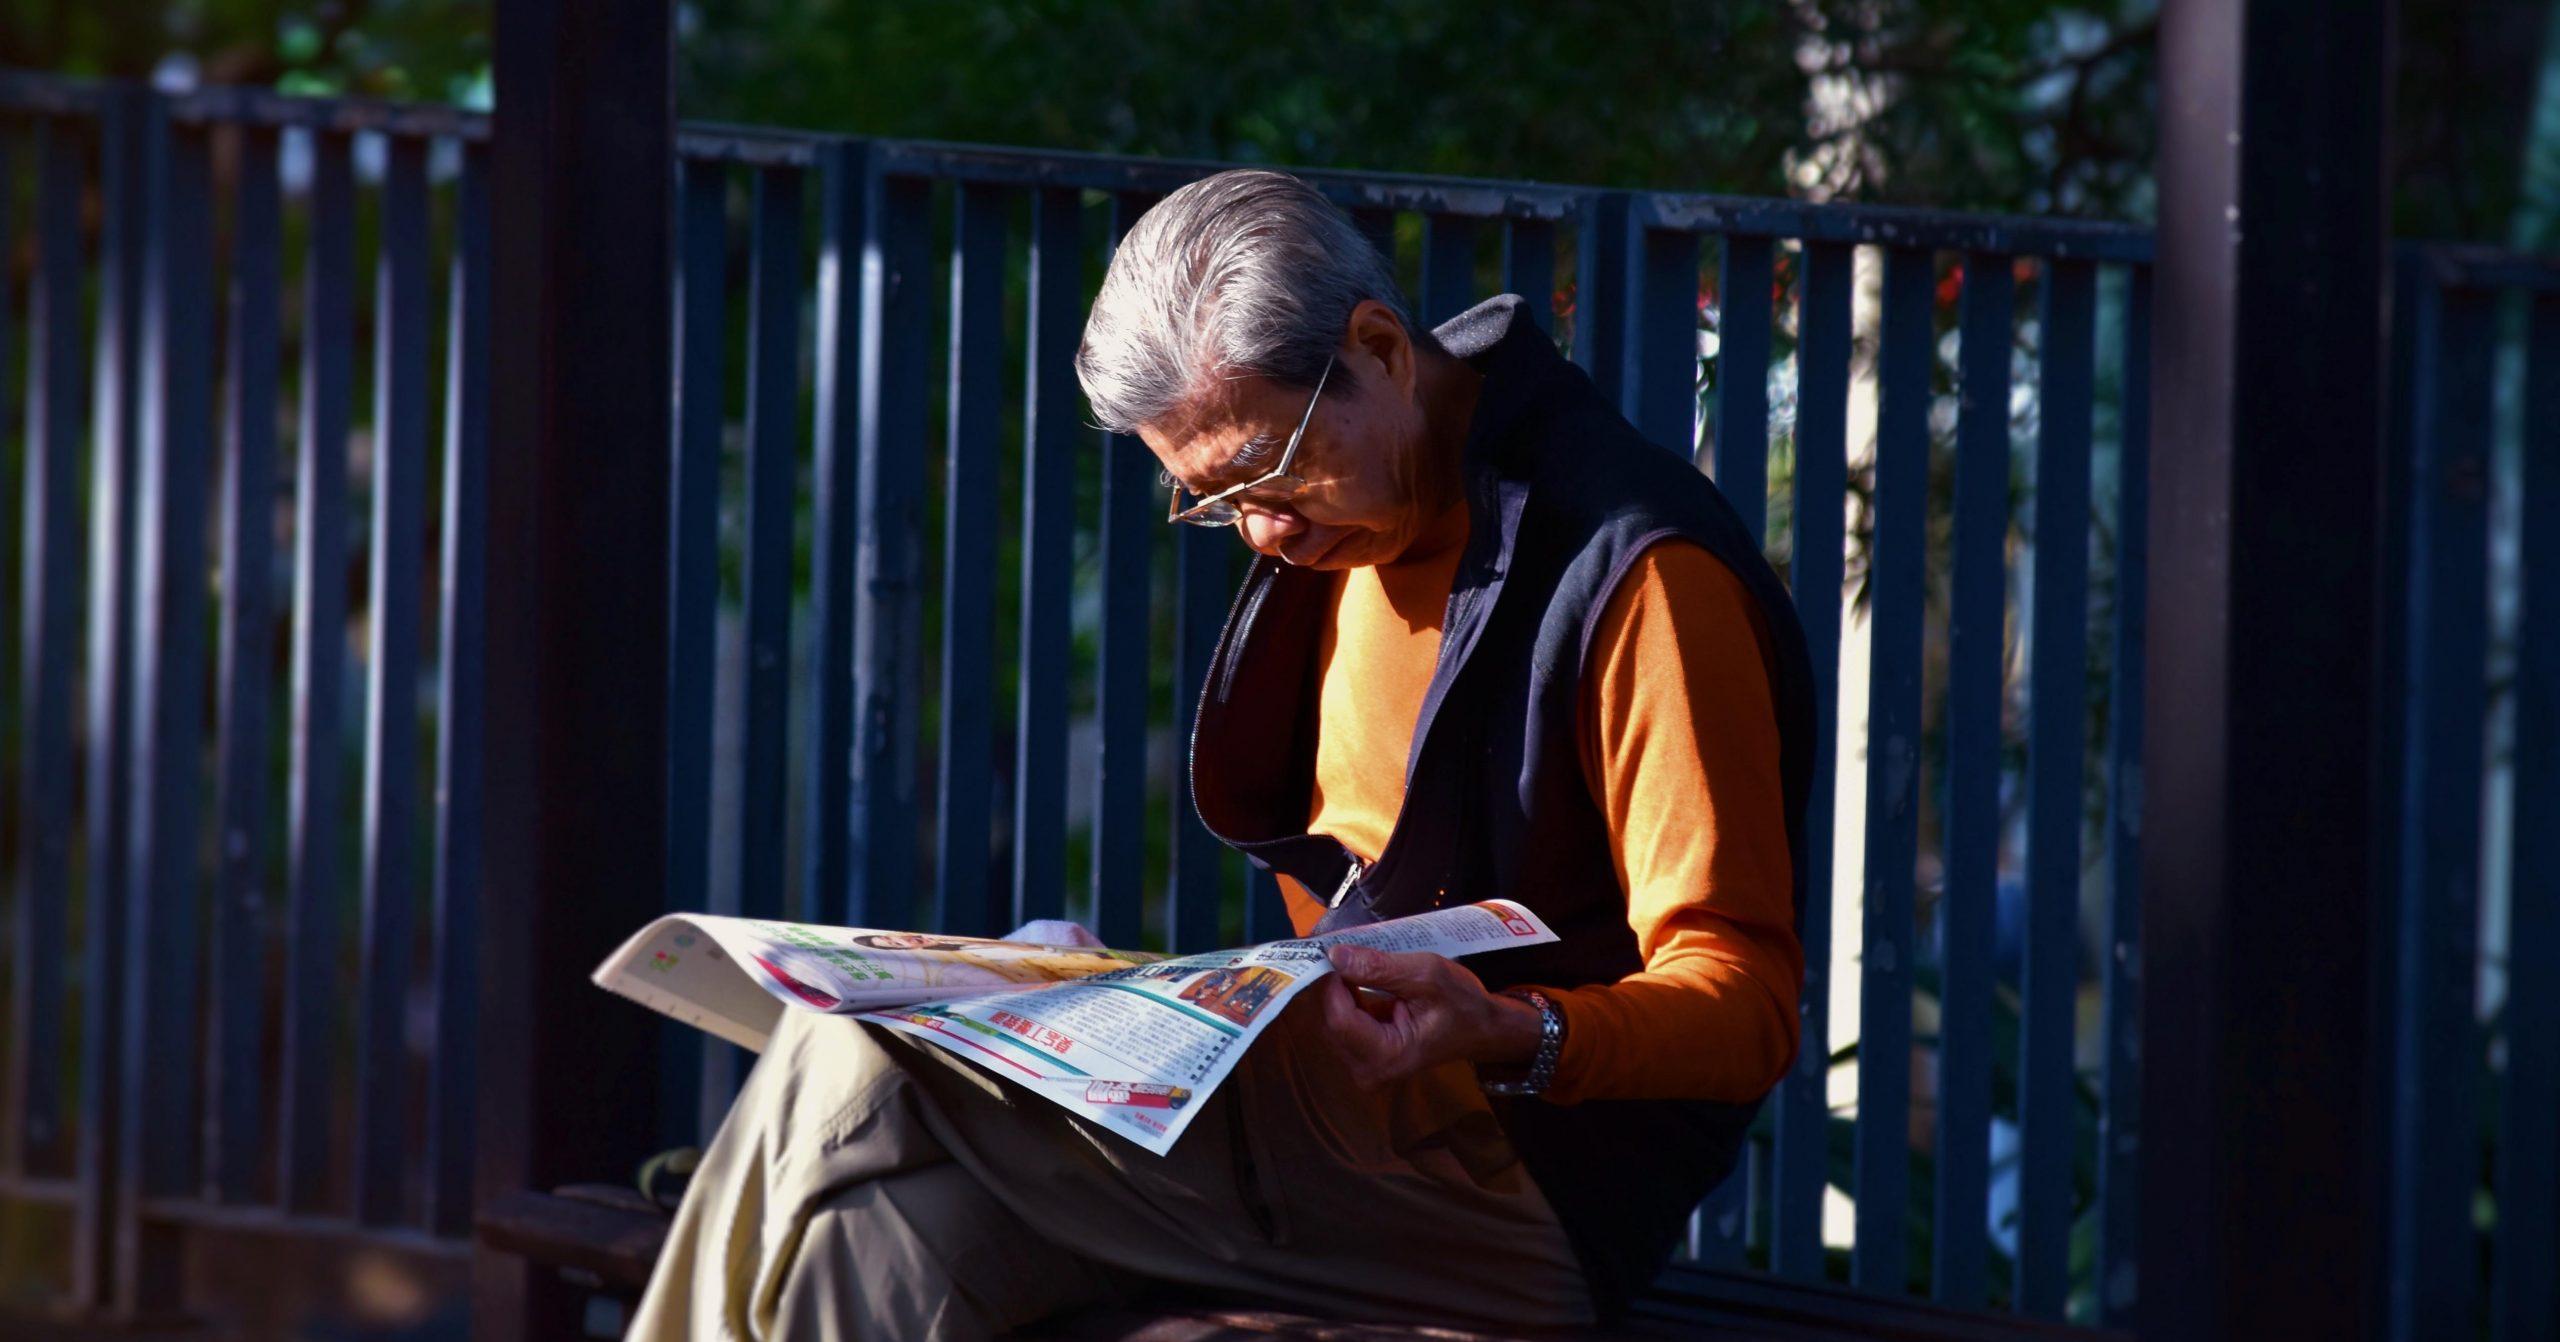 Old man reading newspapers (credit: mark-hang-fung)